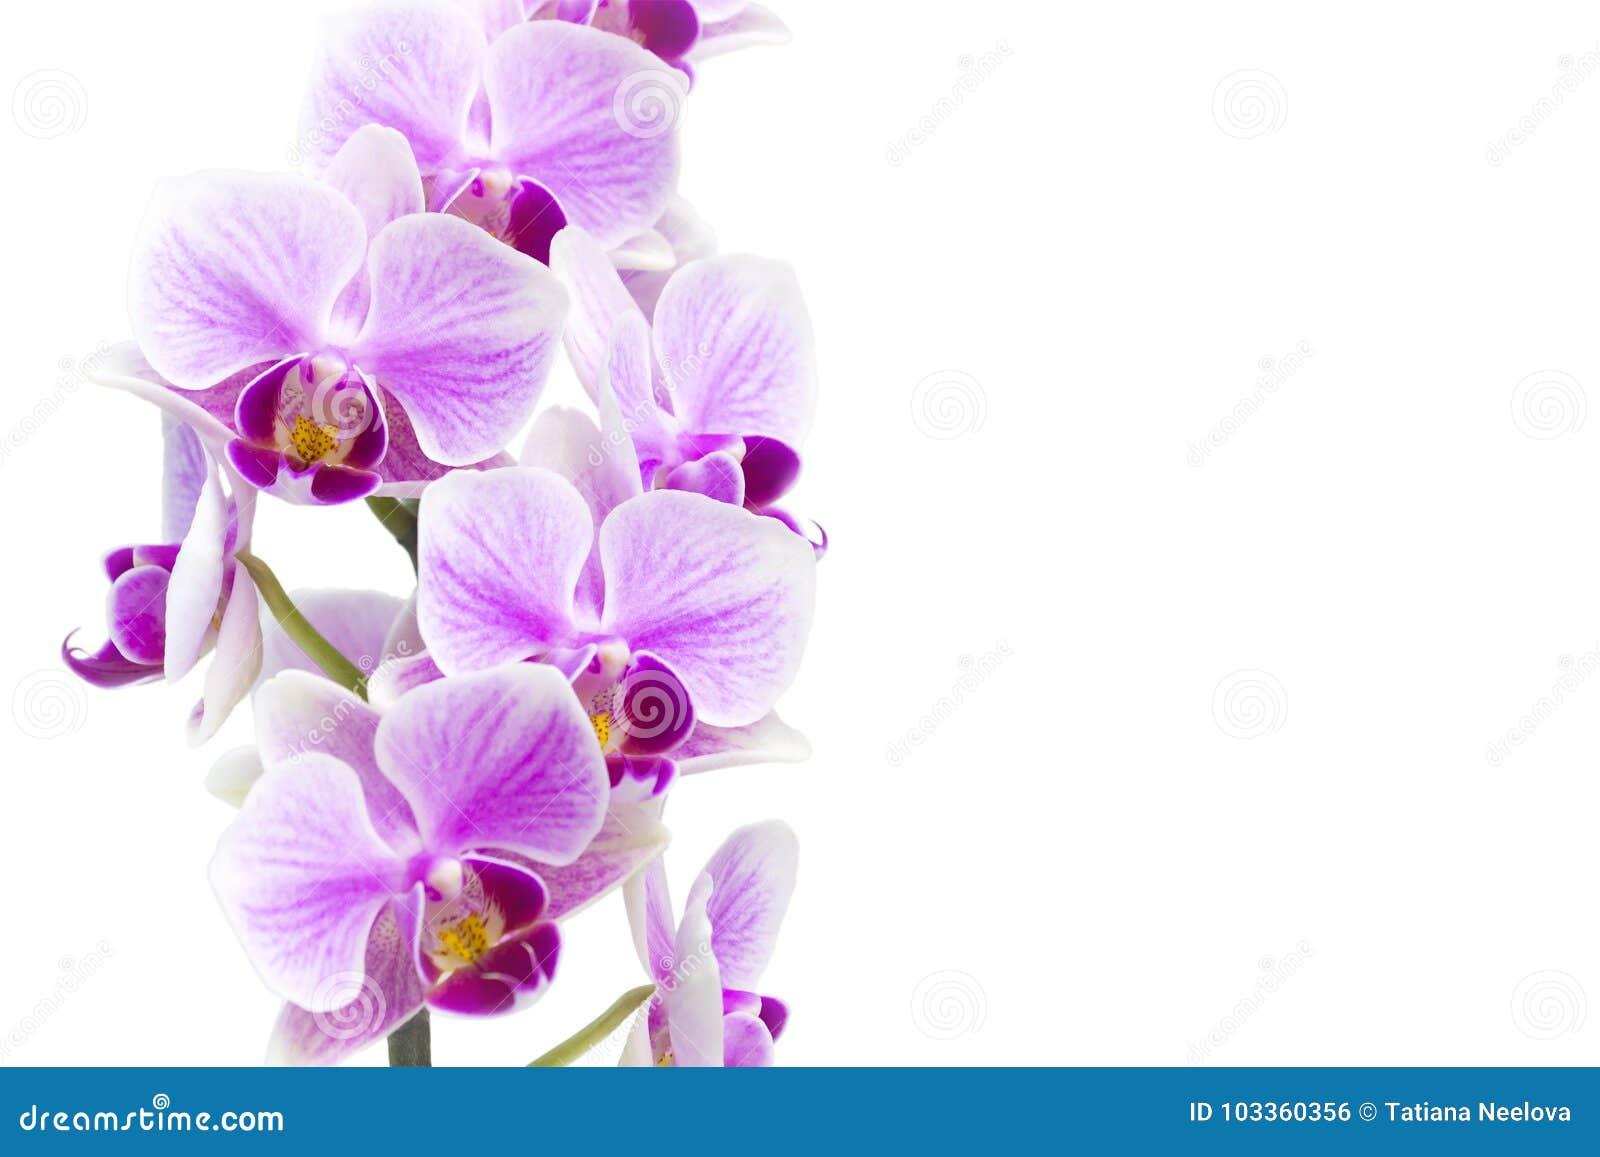 Foto av den mjuka orkidéfilialen som blomstrar med lilablommor som isoleras på vit bakgrund Blommande twi för Phalaenopsisorkidéb